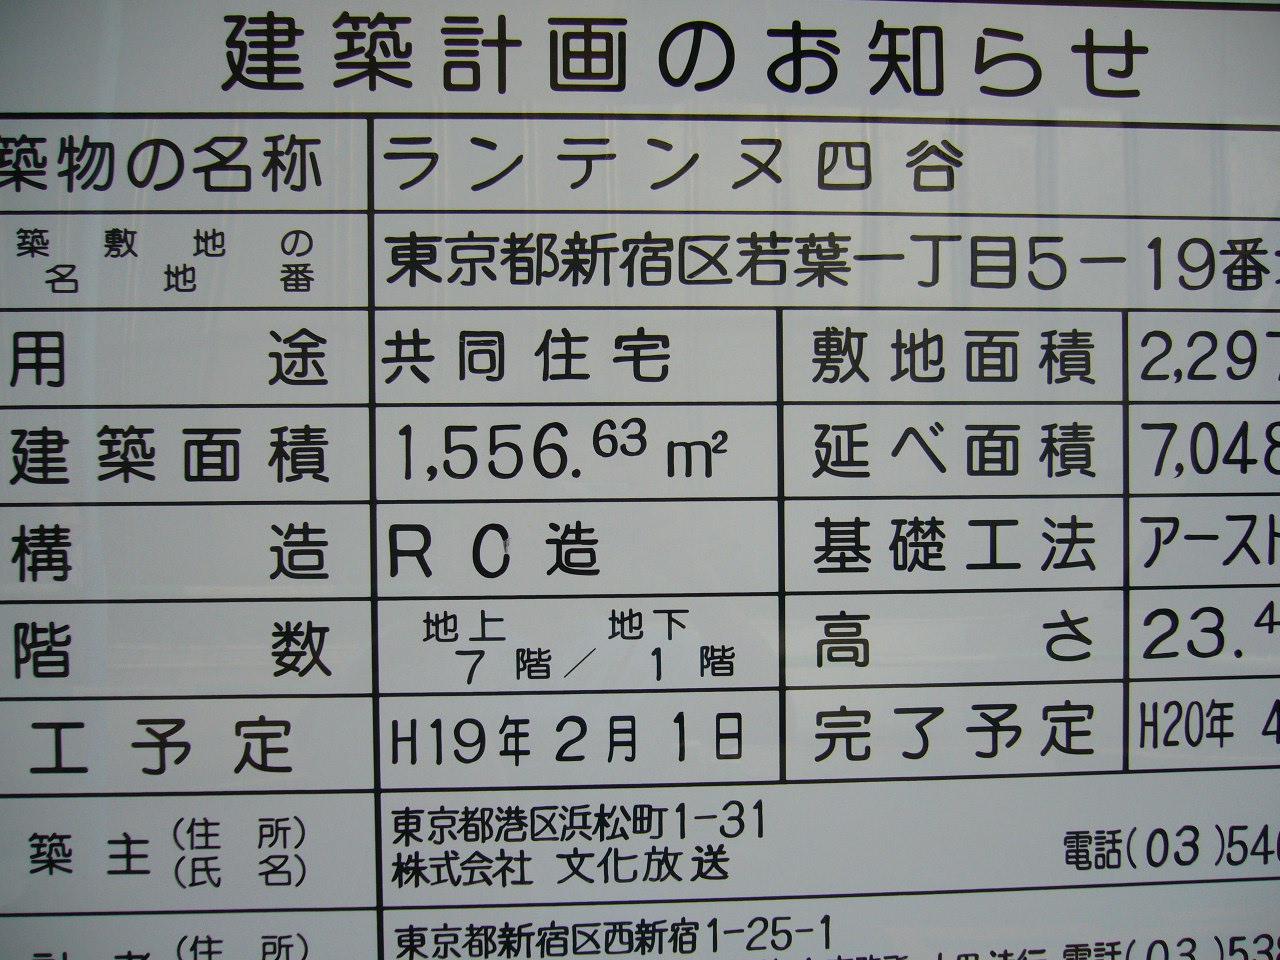 P1010681.JPG